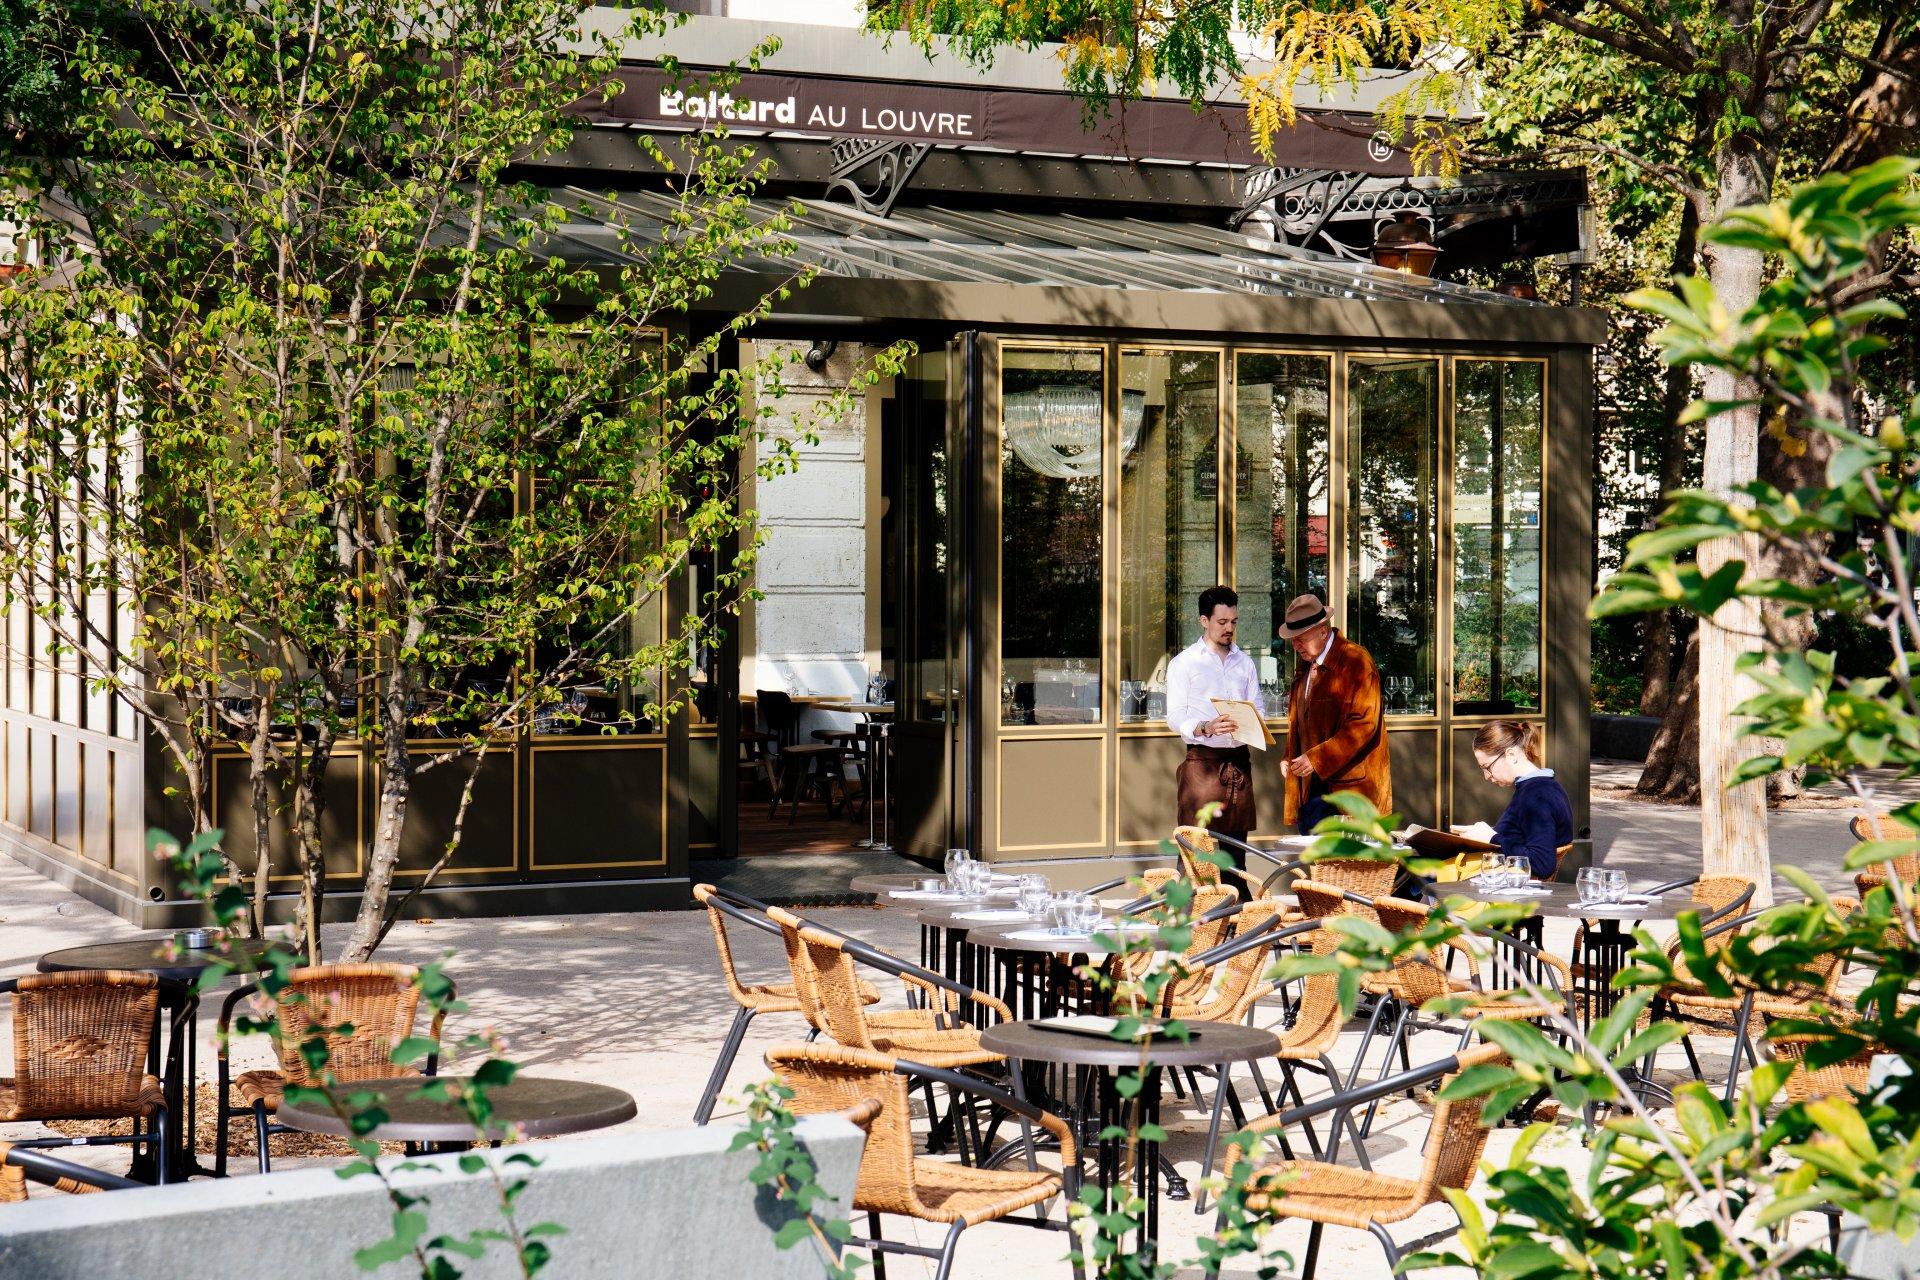 Restaurant Paris Baltard au Louvre